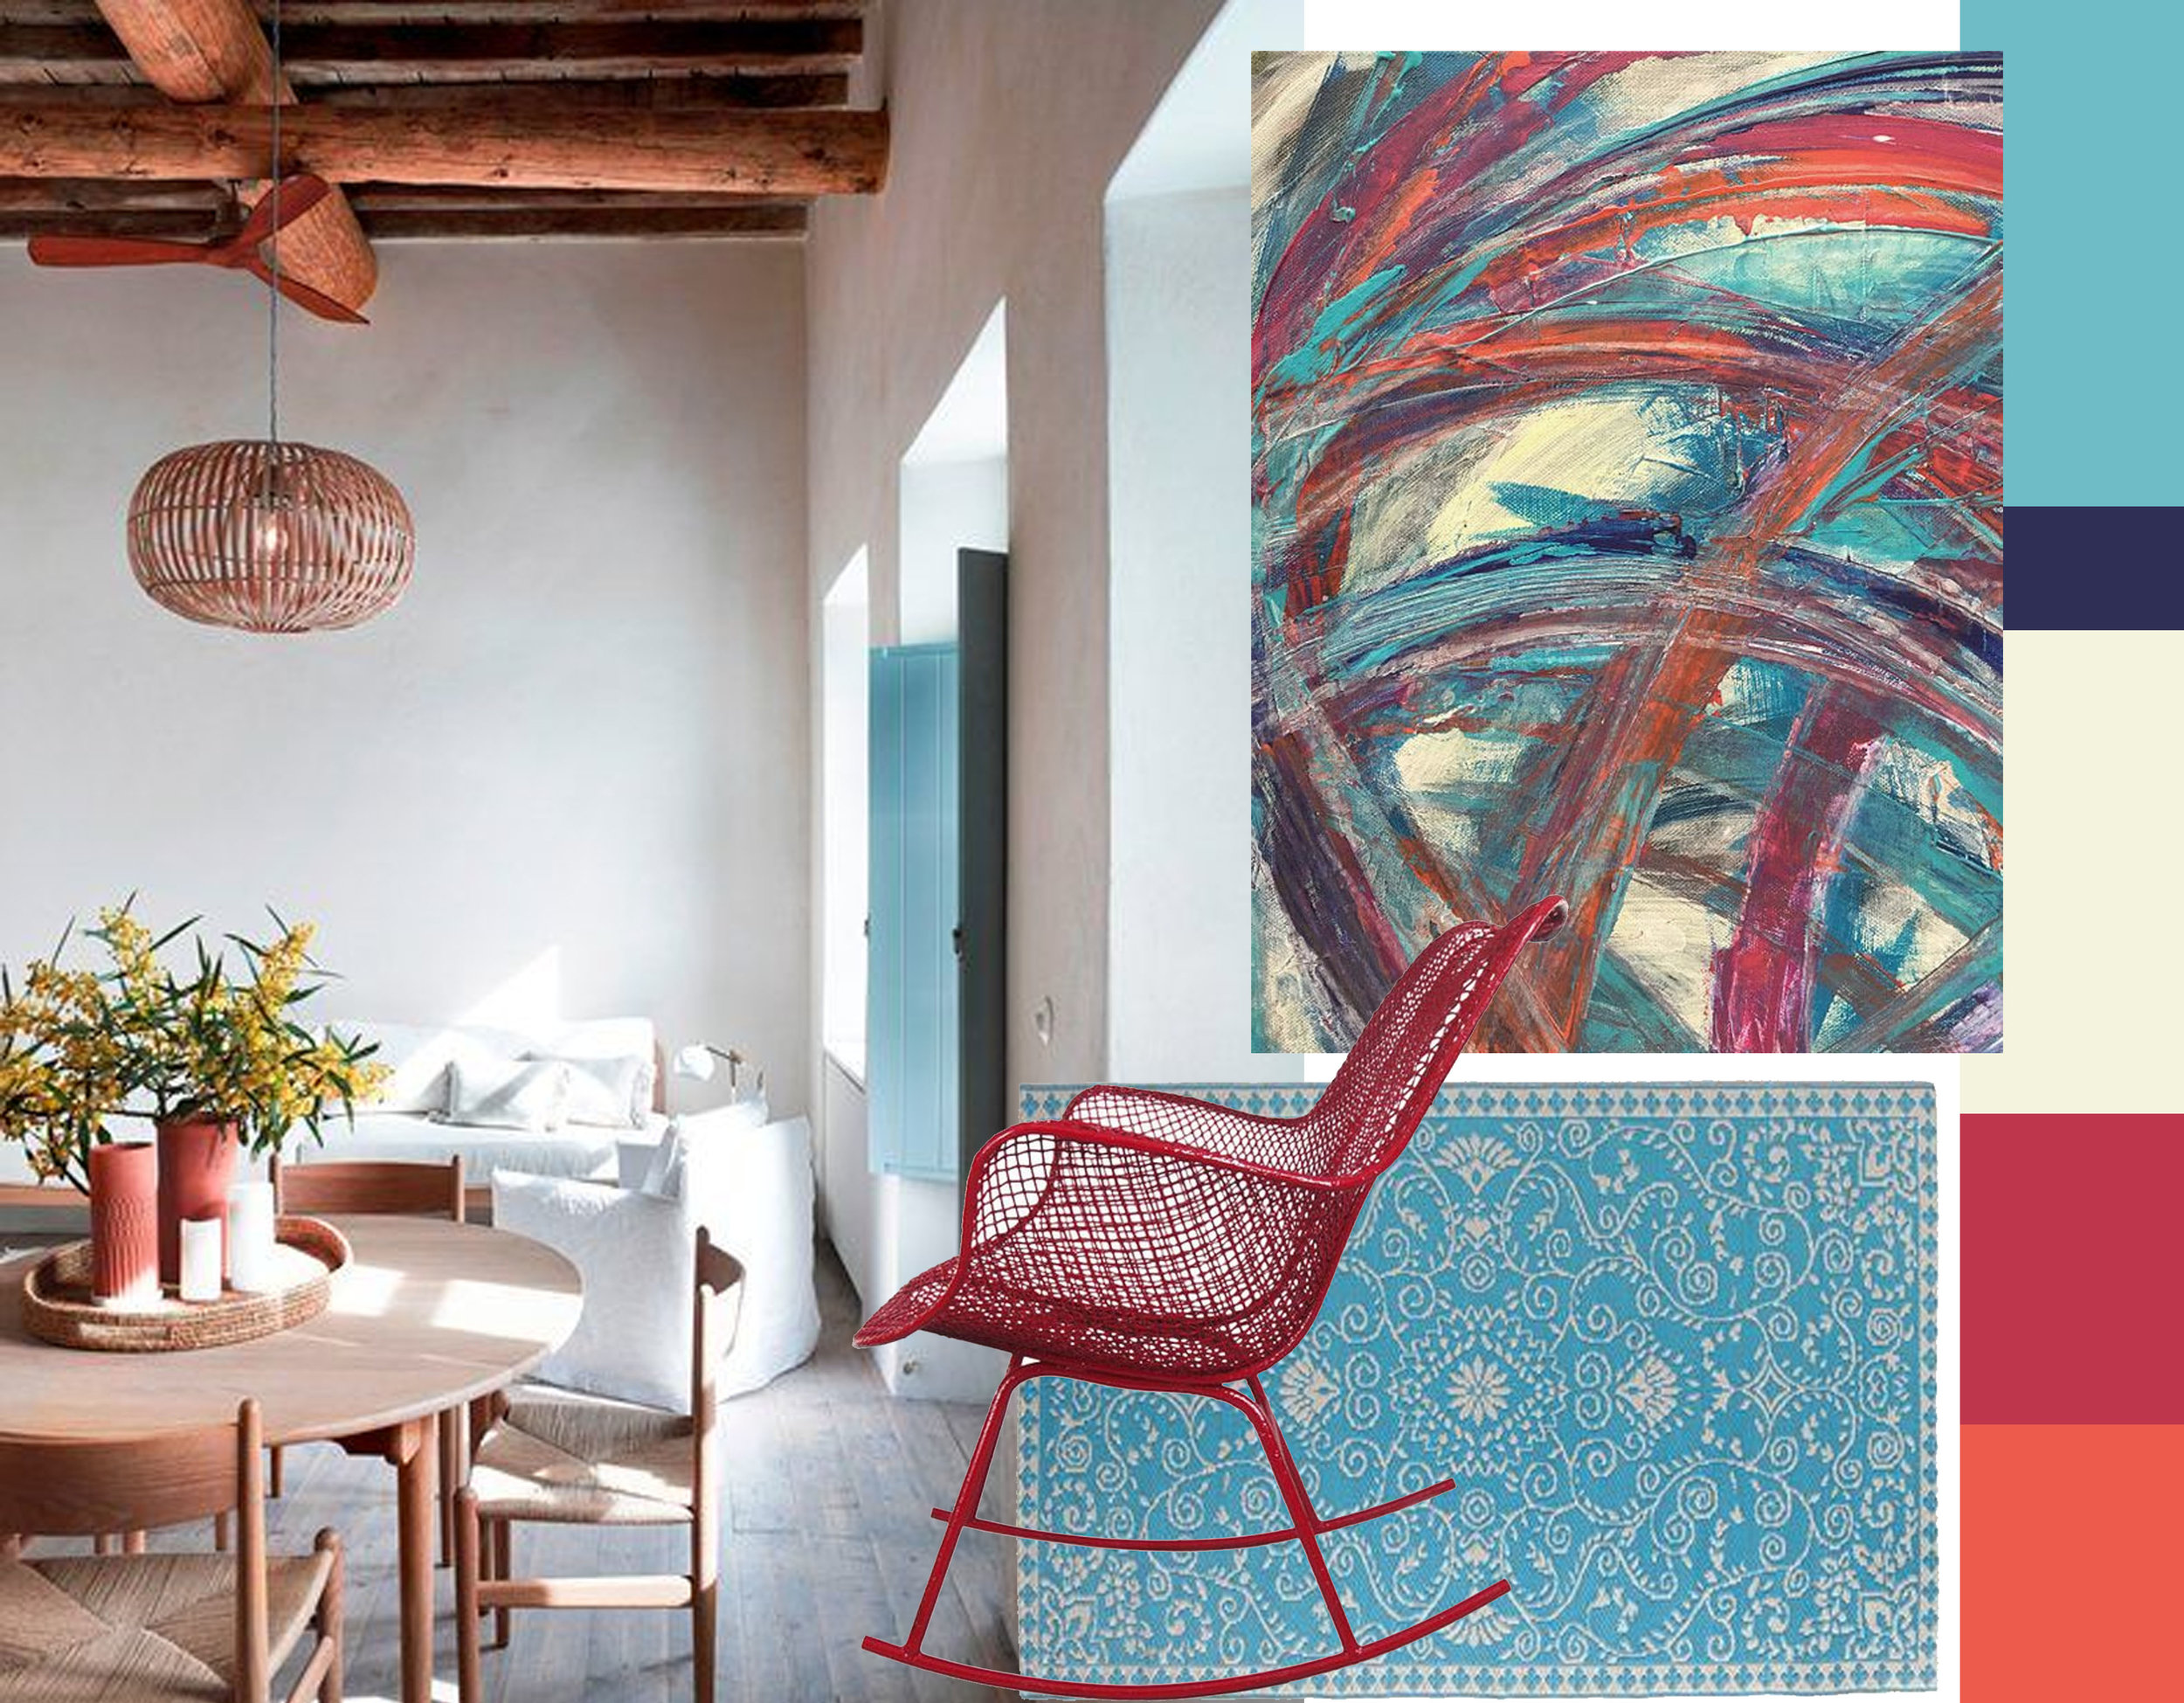 Milos House via  Archilovers  - rocking chair -detail artwork  LIBWAde